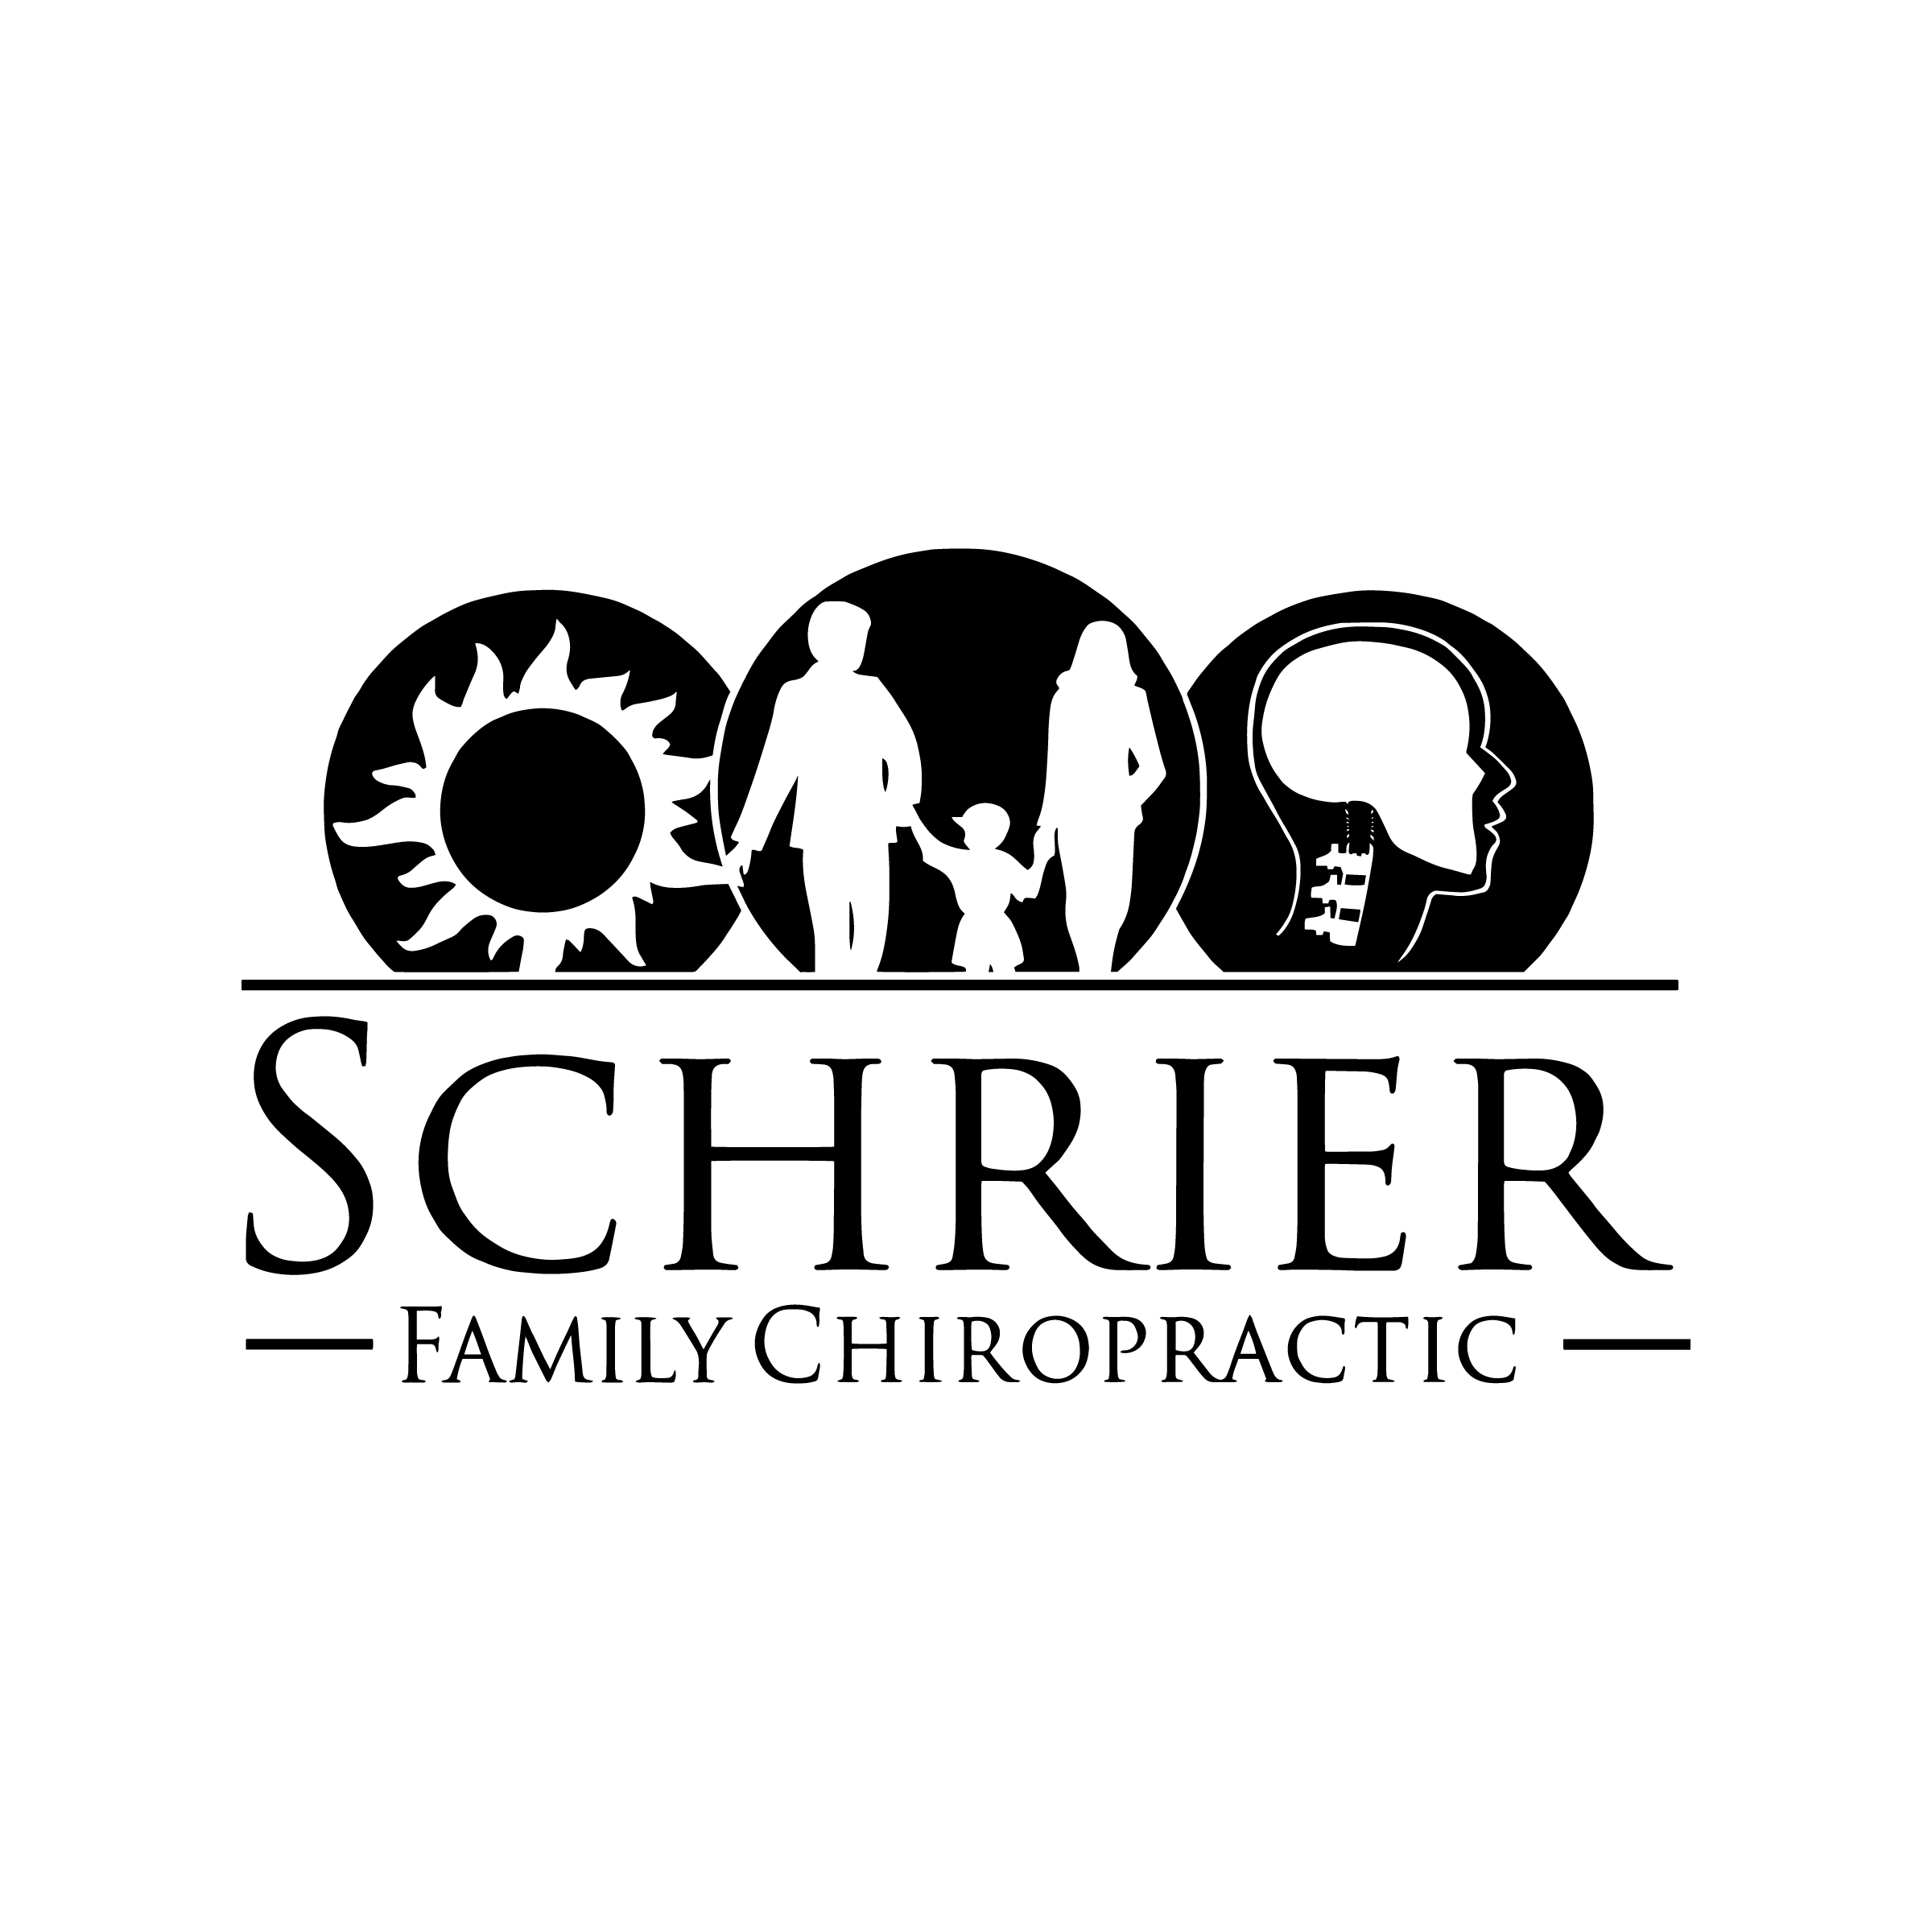 schrier-01.png